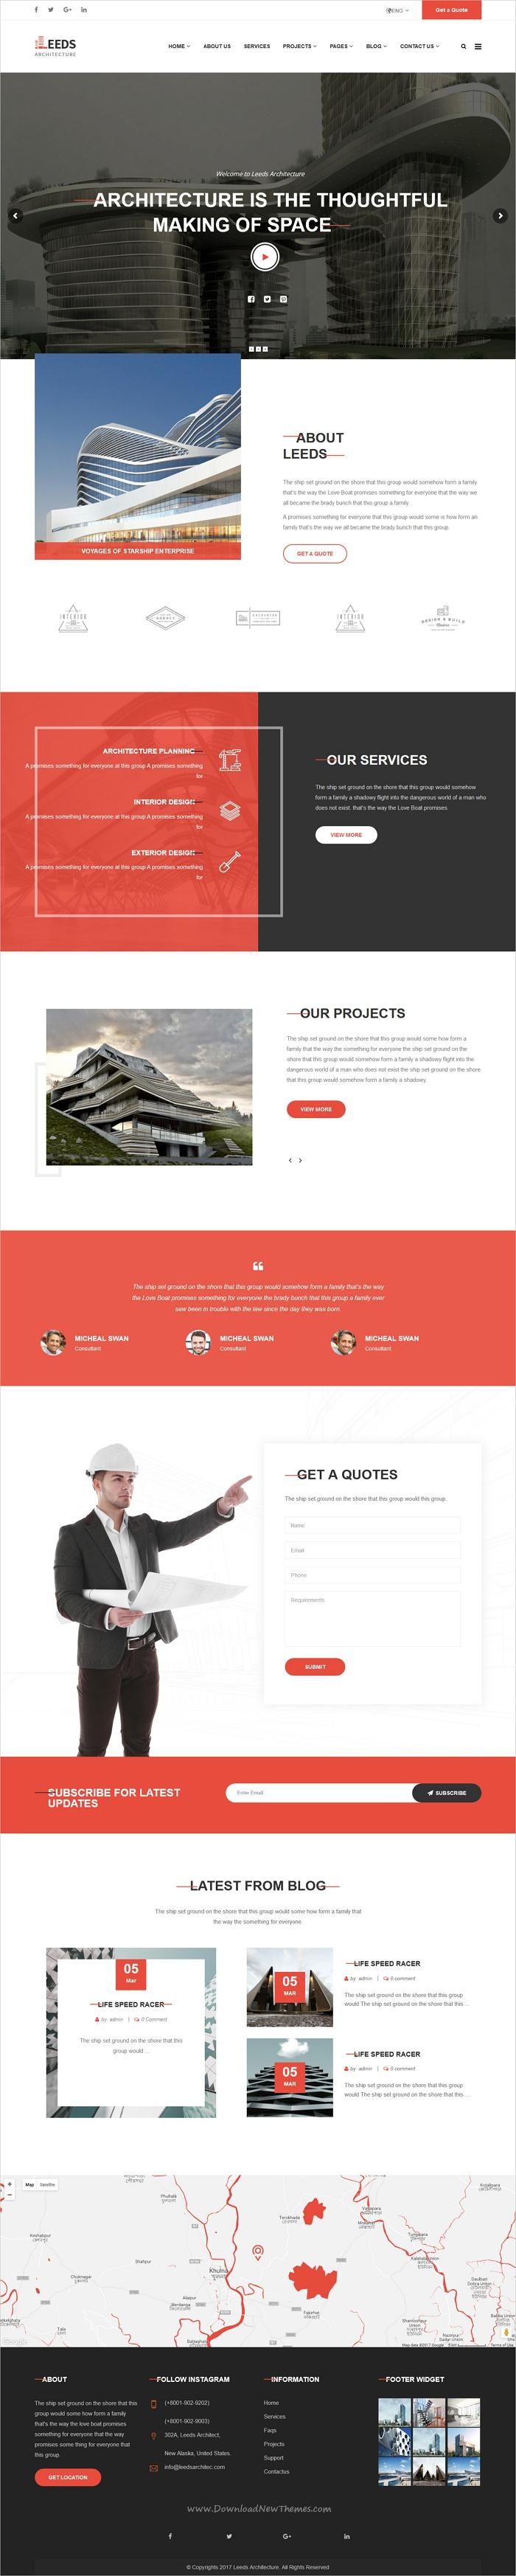 Leeds Interior Design Wordpress Theme Agency Website Design Article Design Beauty Design